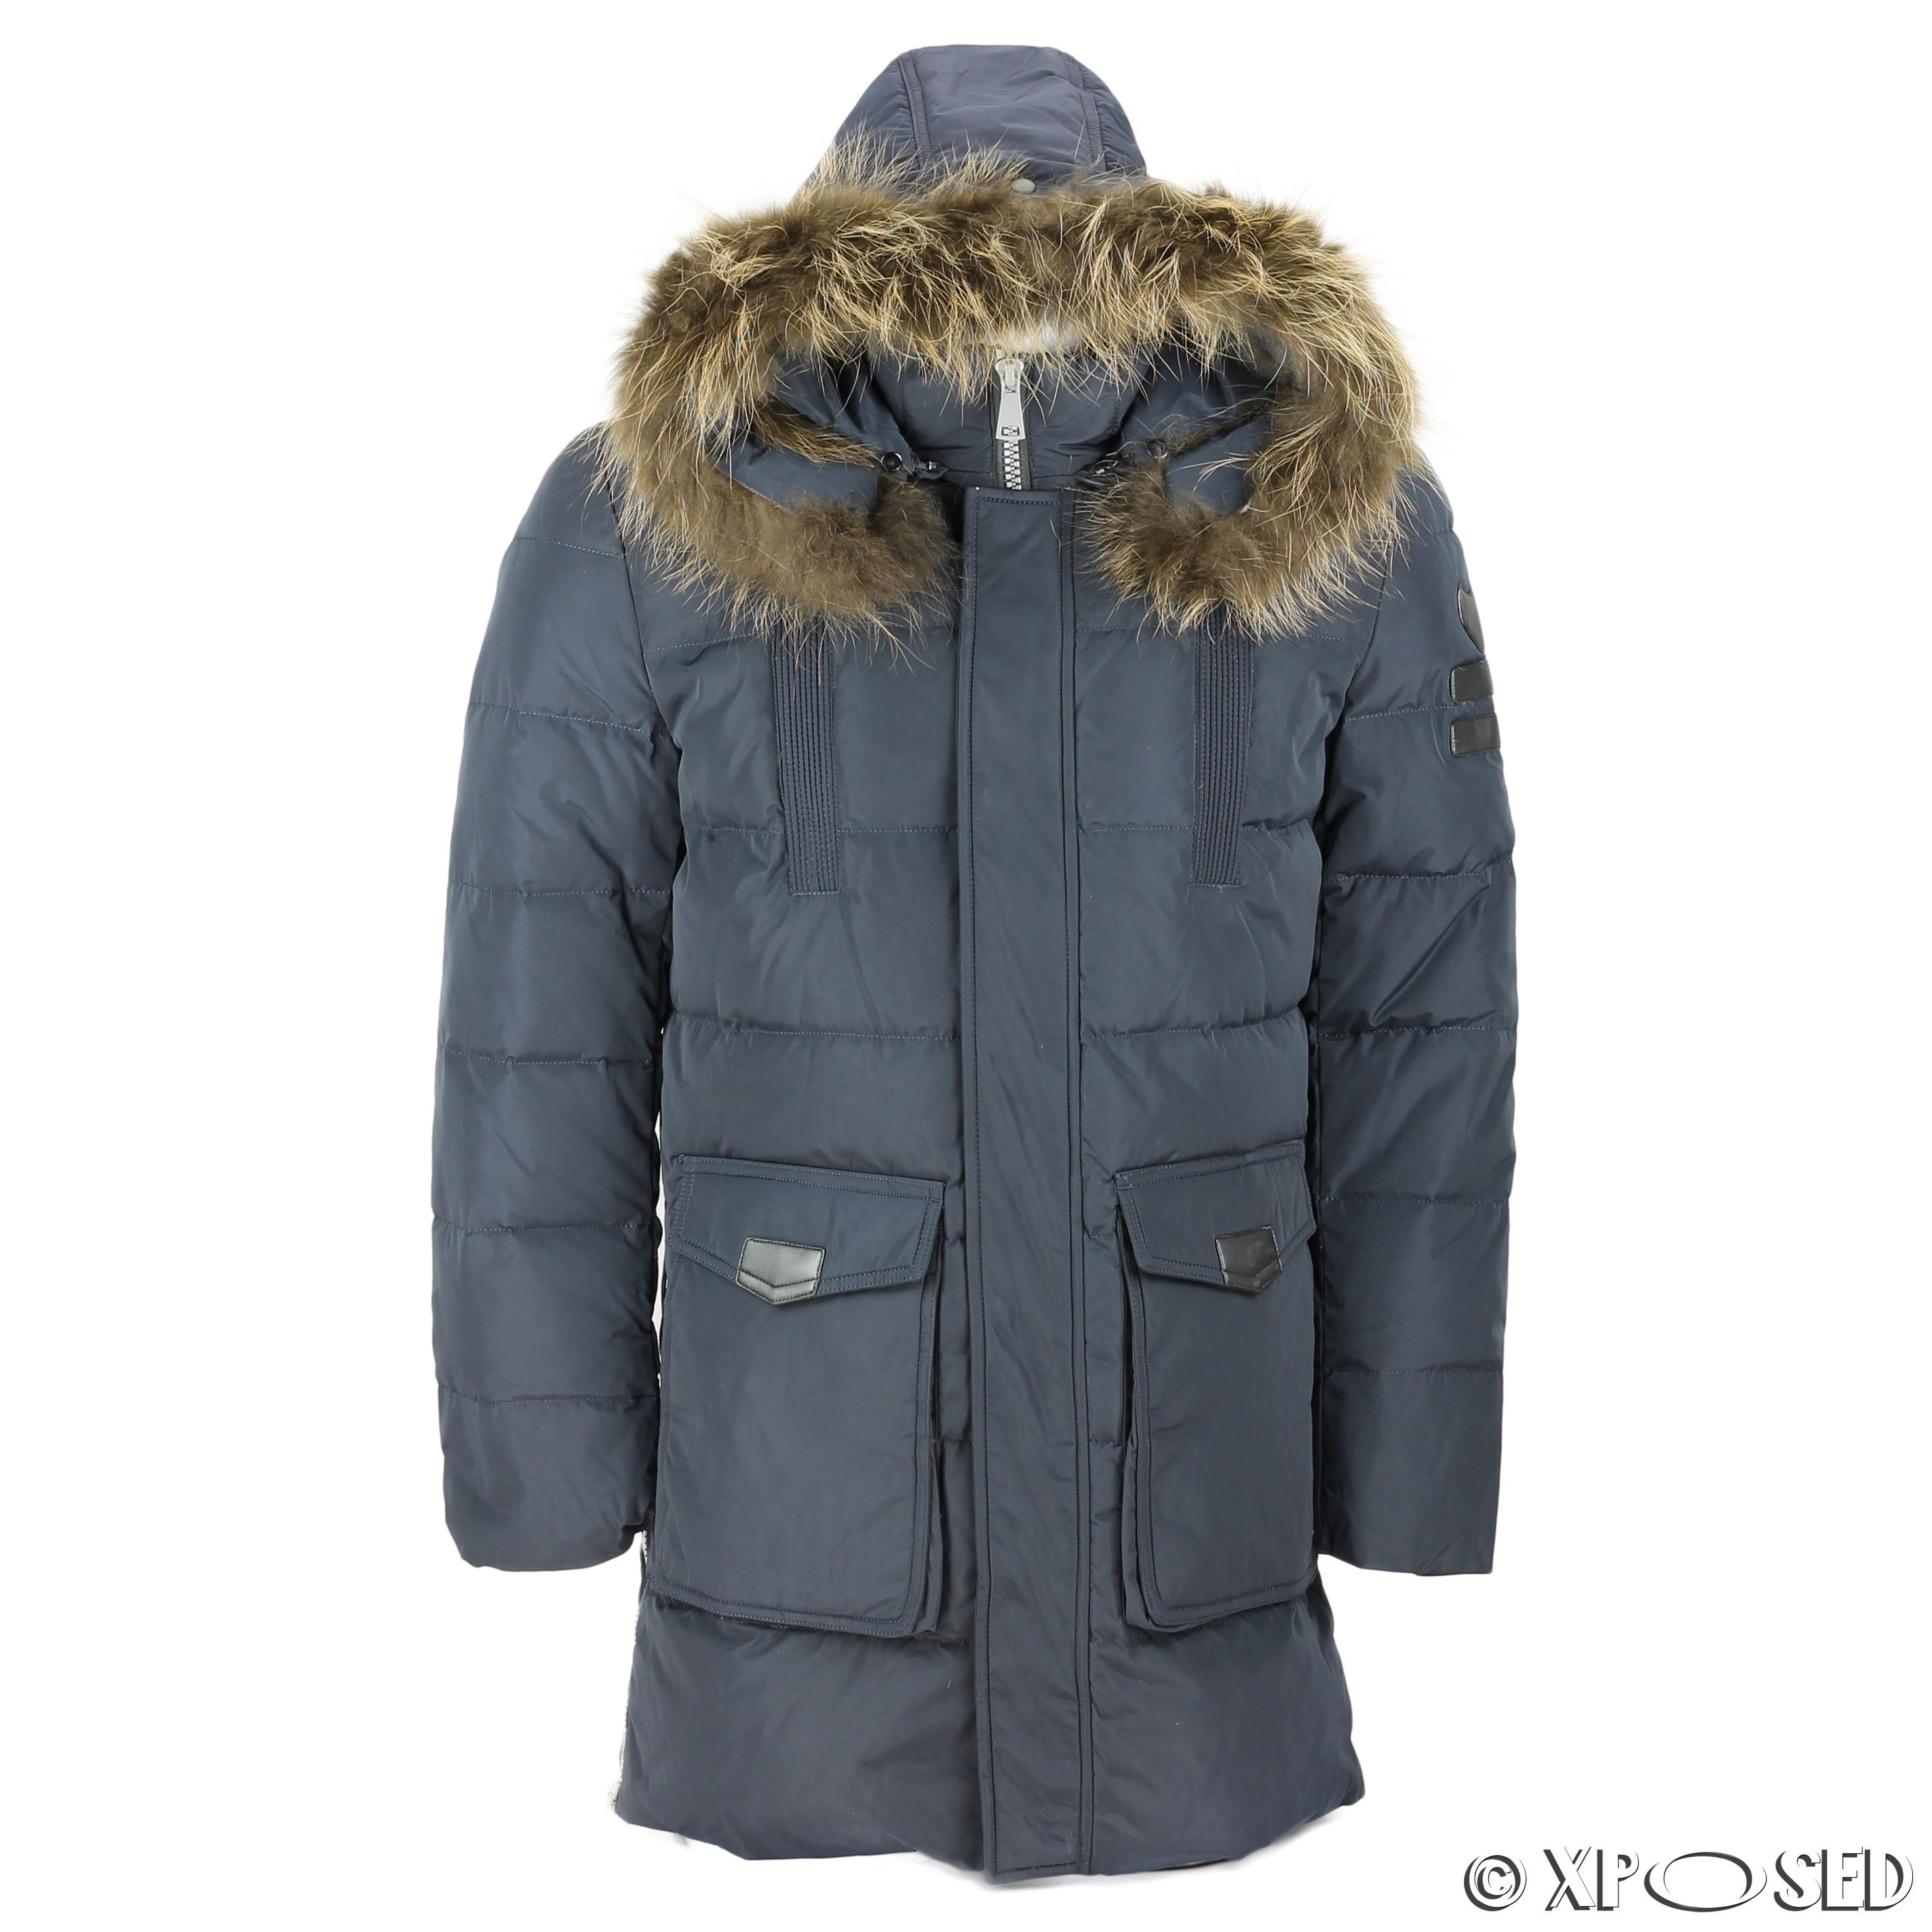 3514c9ce752e New Mens Puffer Padded Fur Hood Down Jacket Winter Warm Parka Coat ...